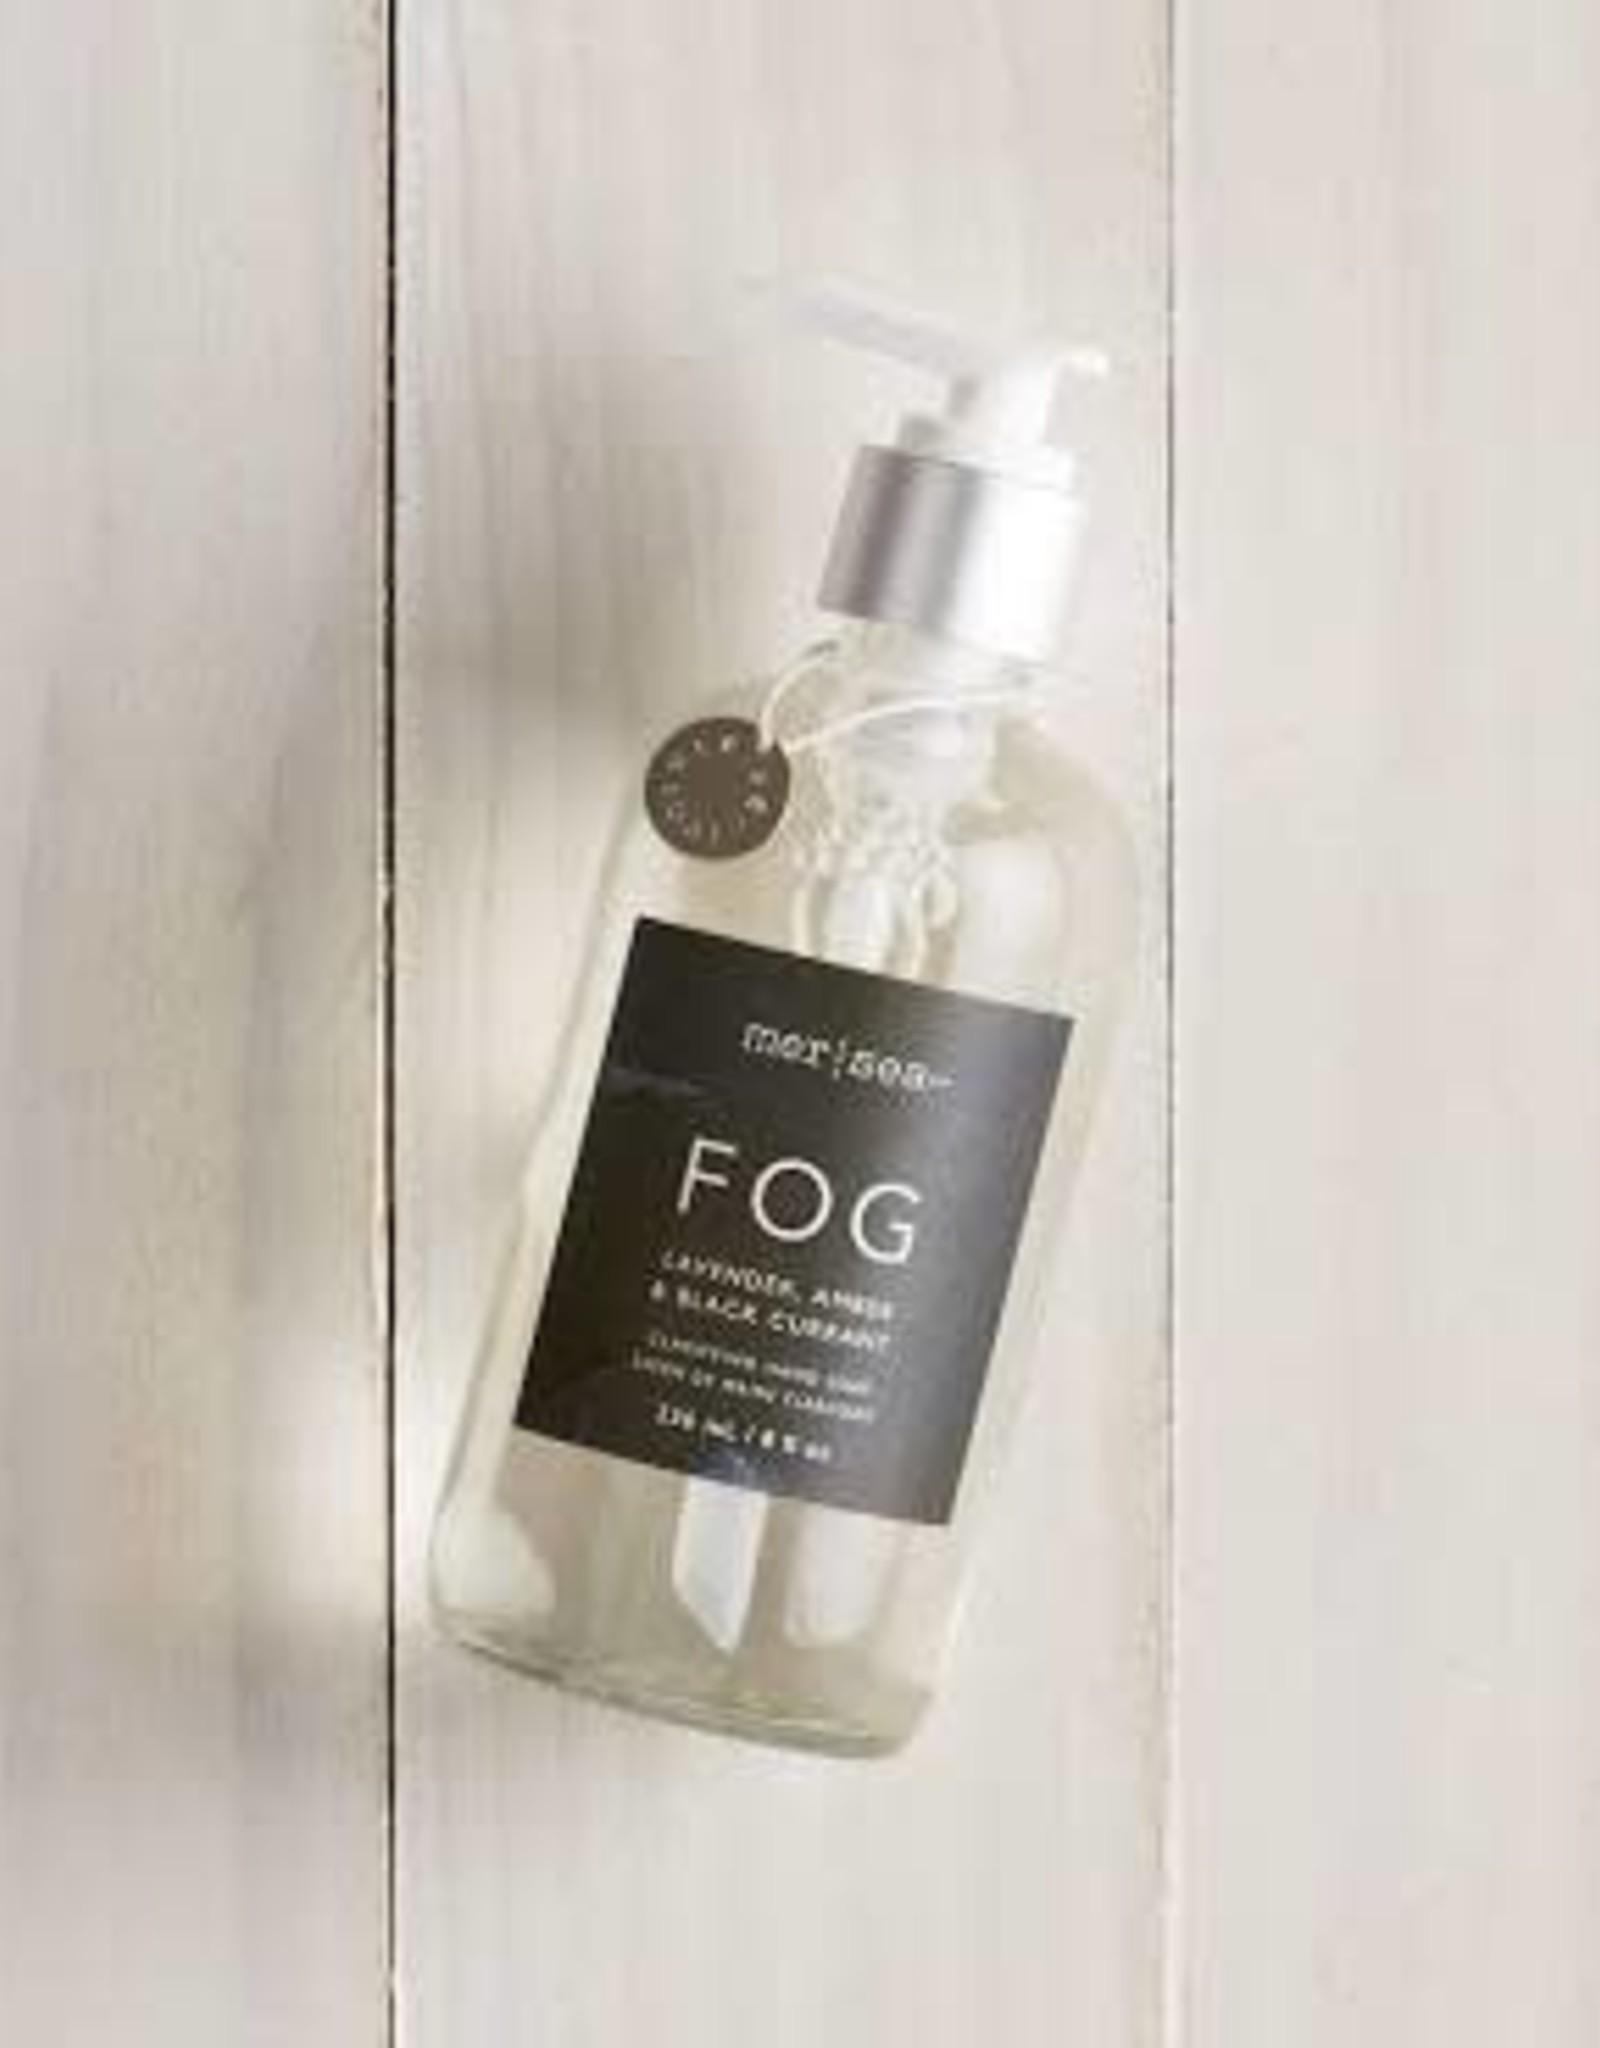 Mer Sea Fog 8oz Glass Hand Soap